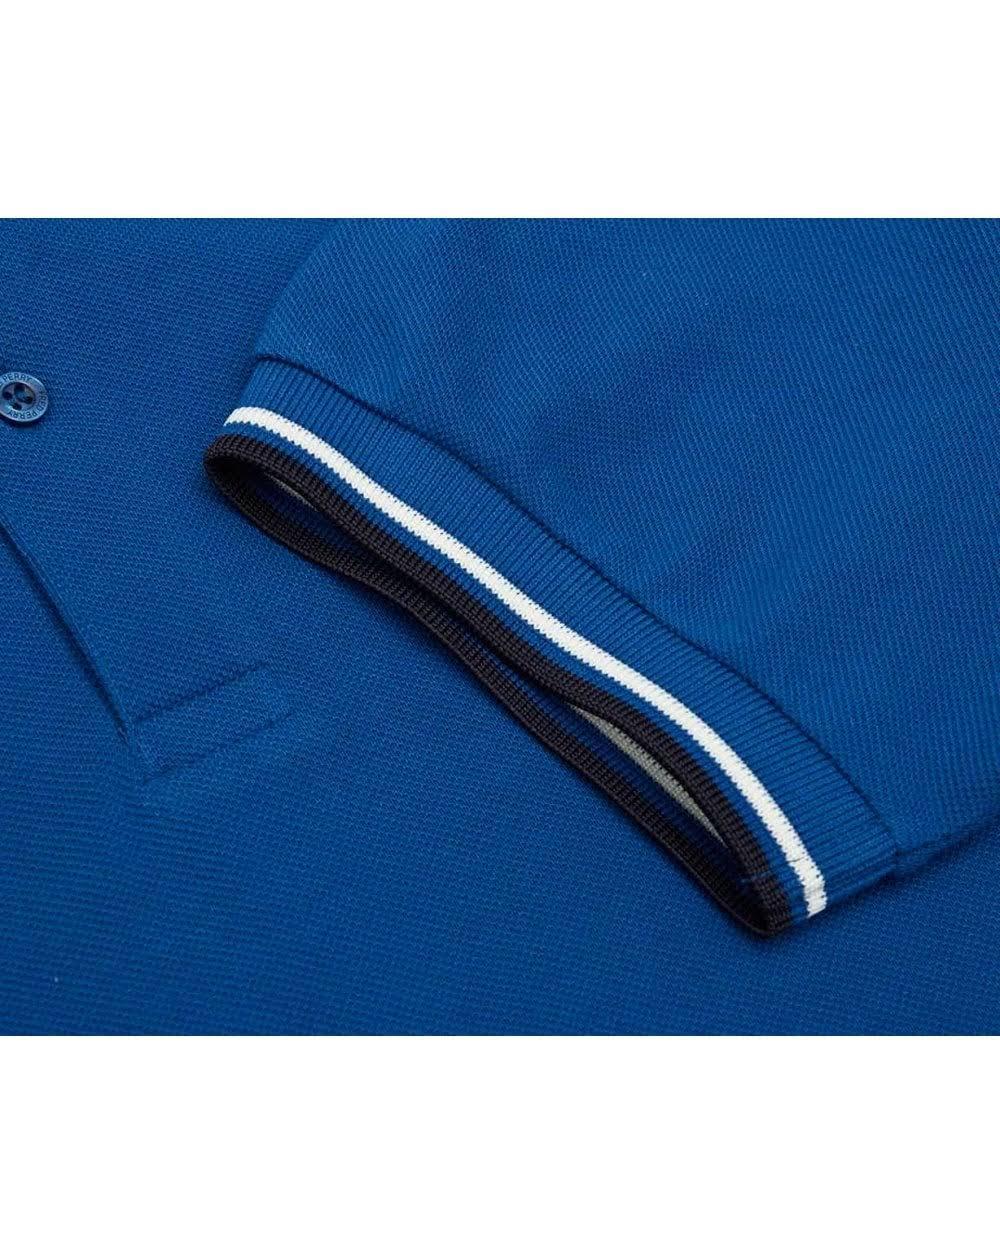 corte Polo maniche blu punta PerryMens doppia con di a Fred 9IeWE2YDH